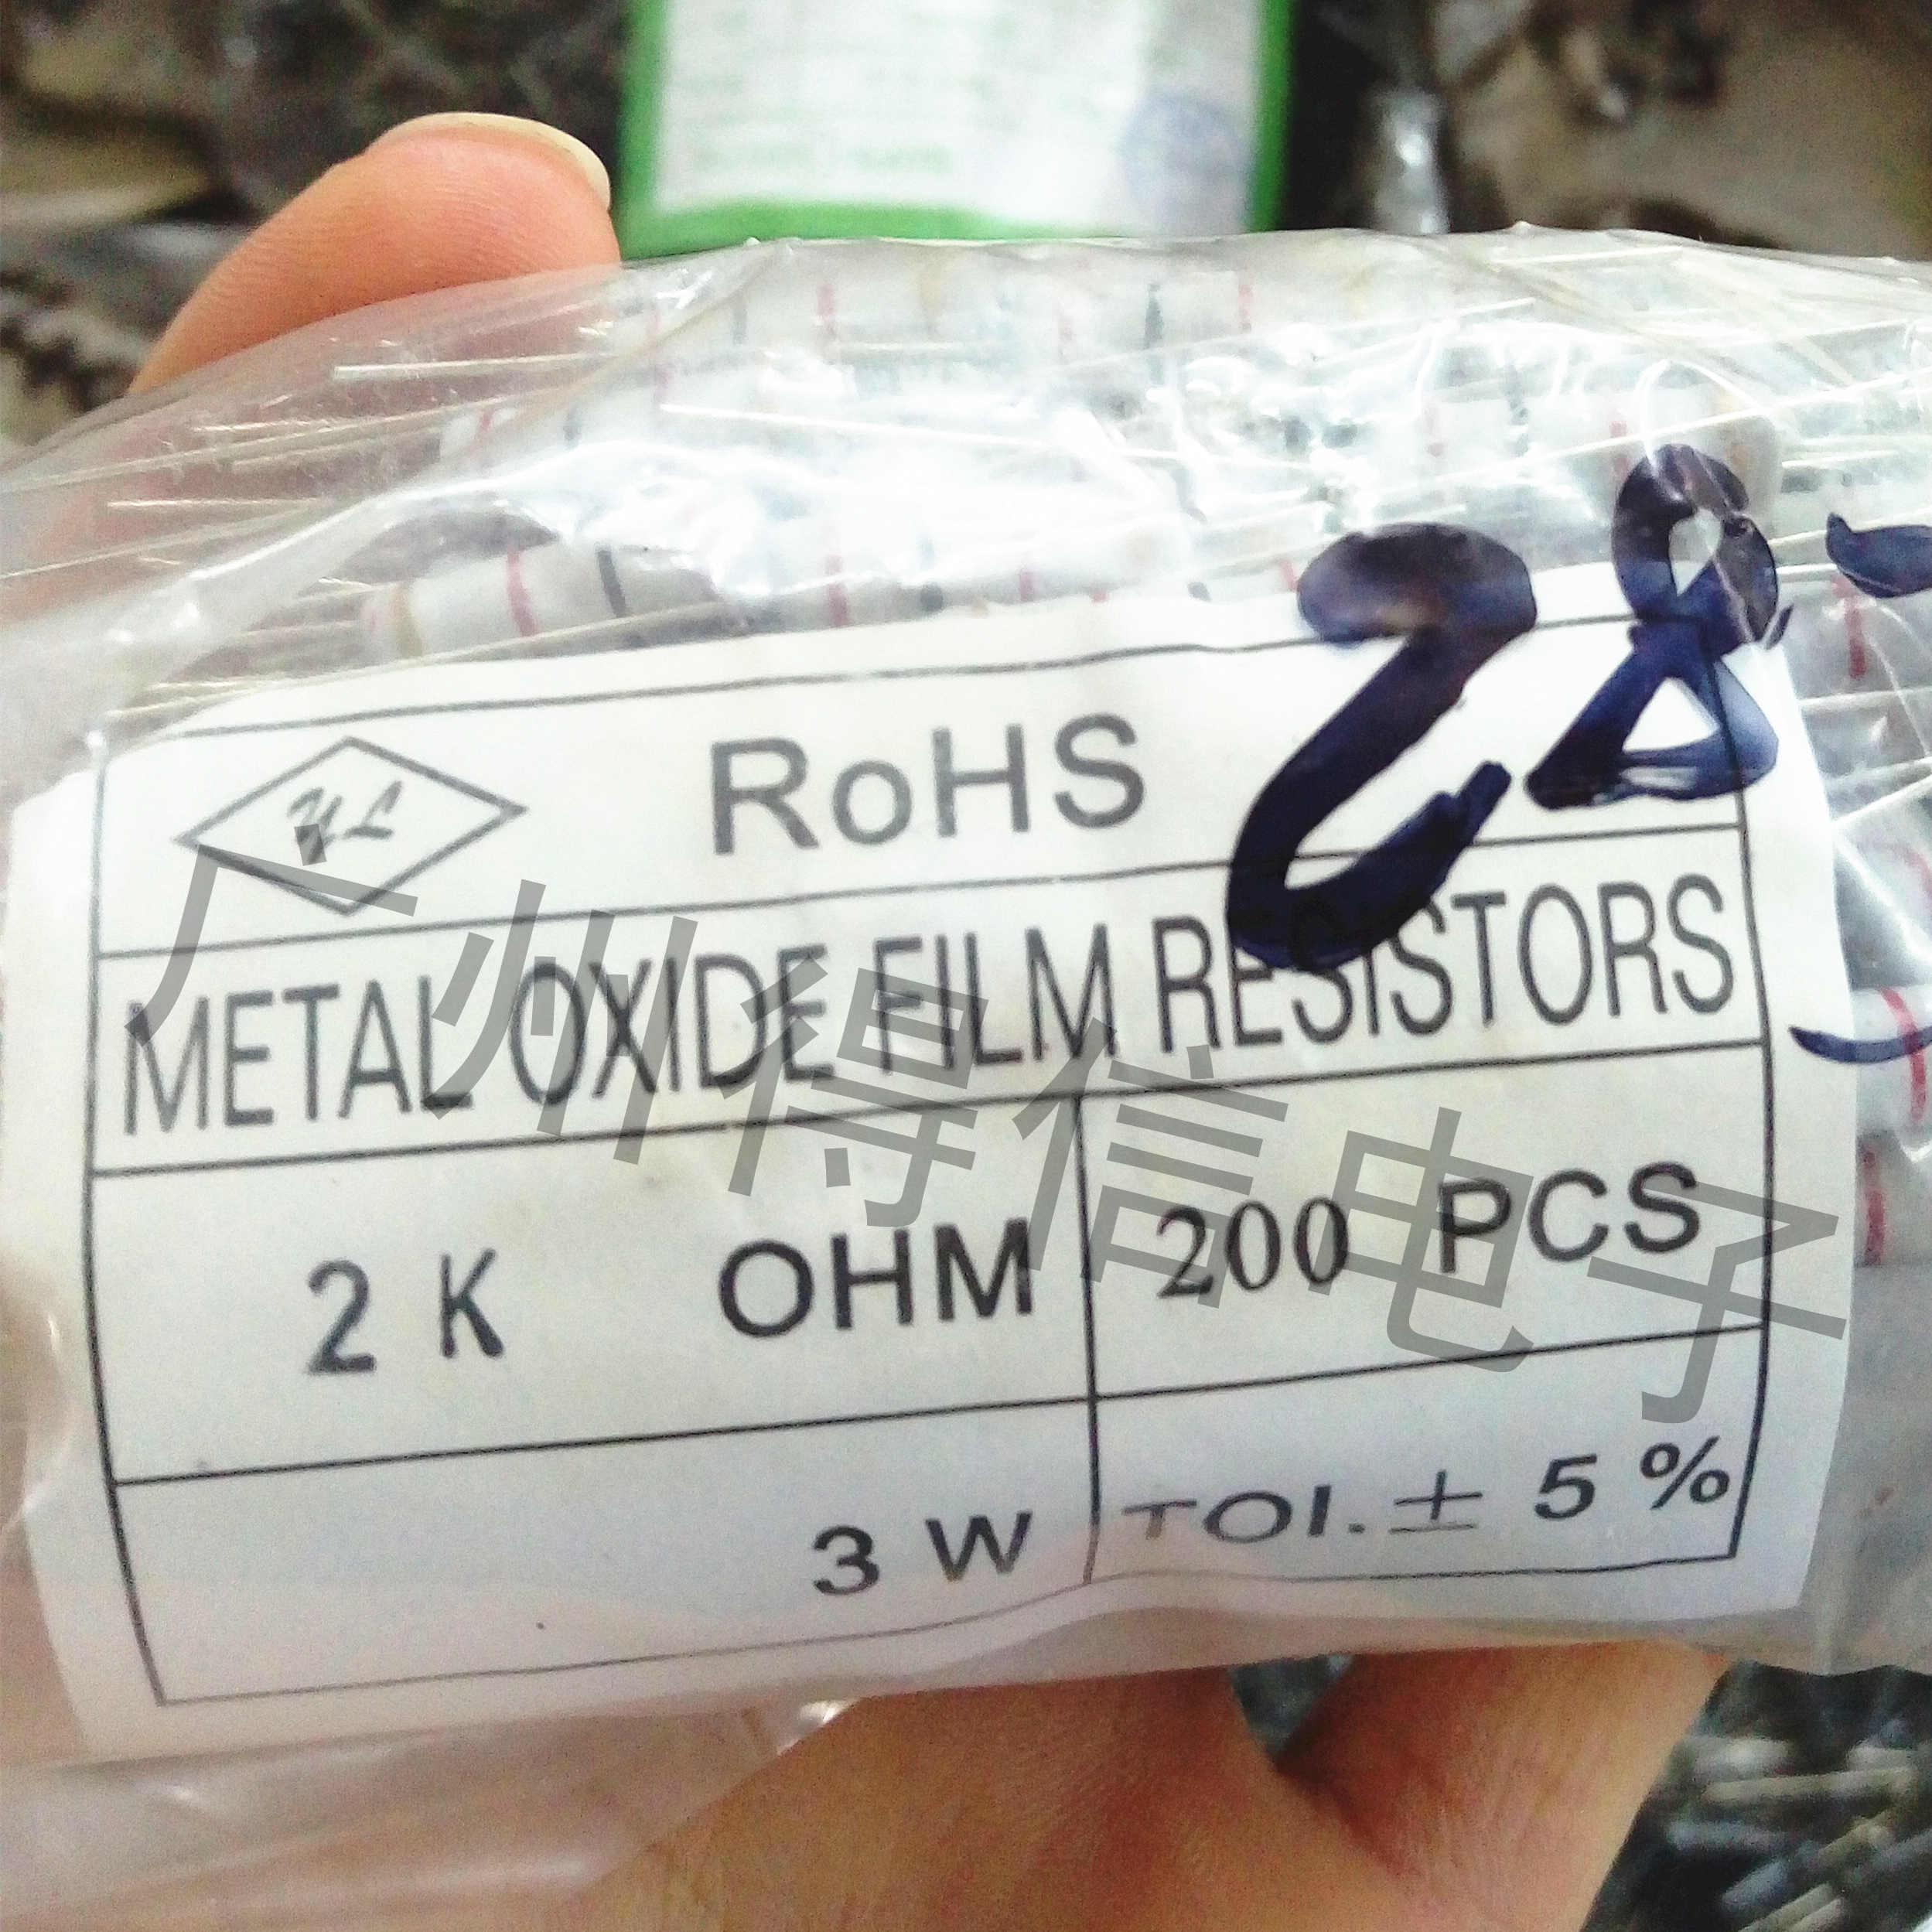 200pcs/Lot new 3W 5% series metal oxide film resistor DIP resistor free shipping 200pcs lot 1w 5